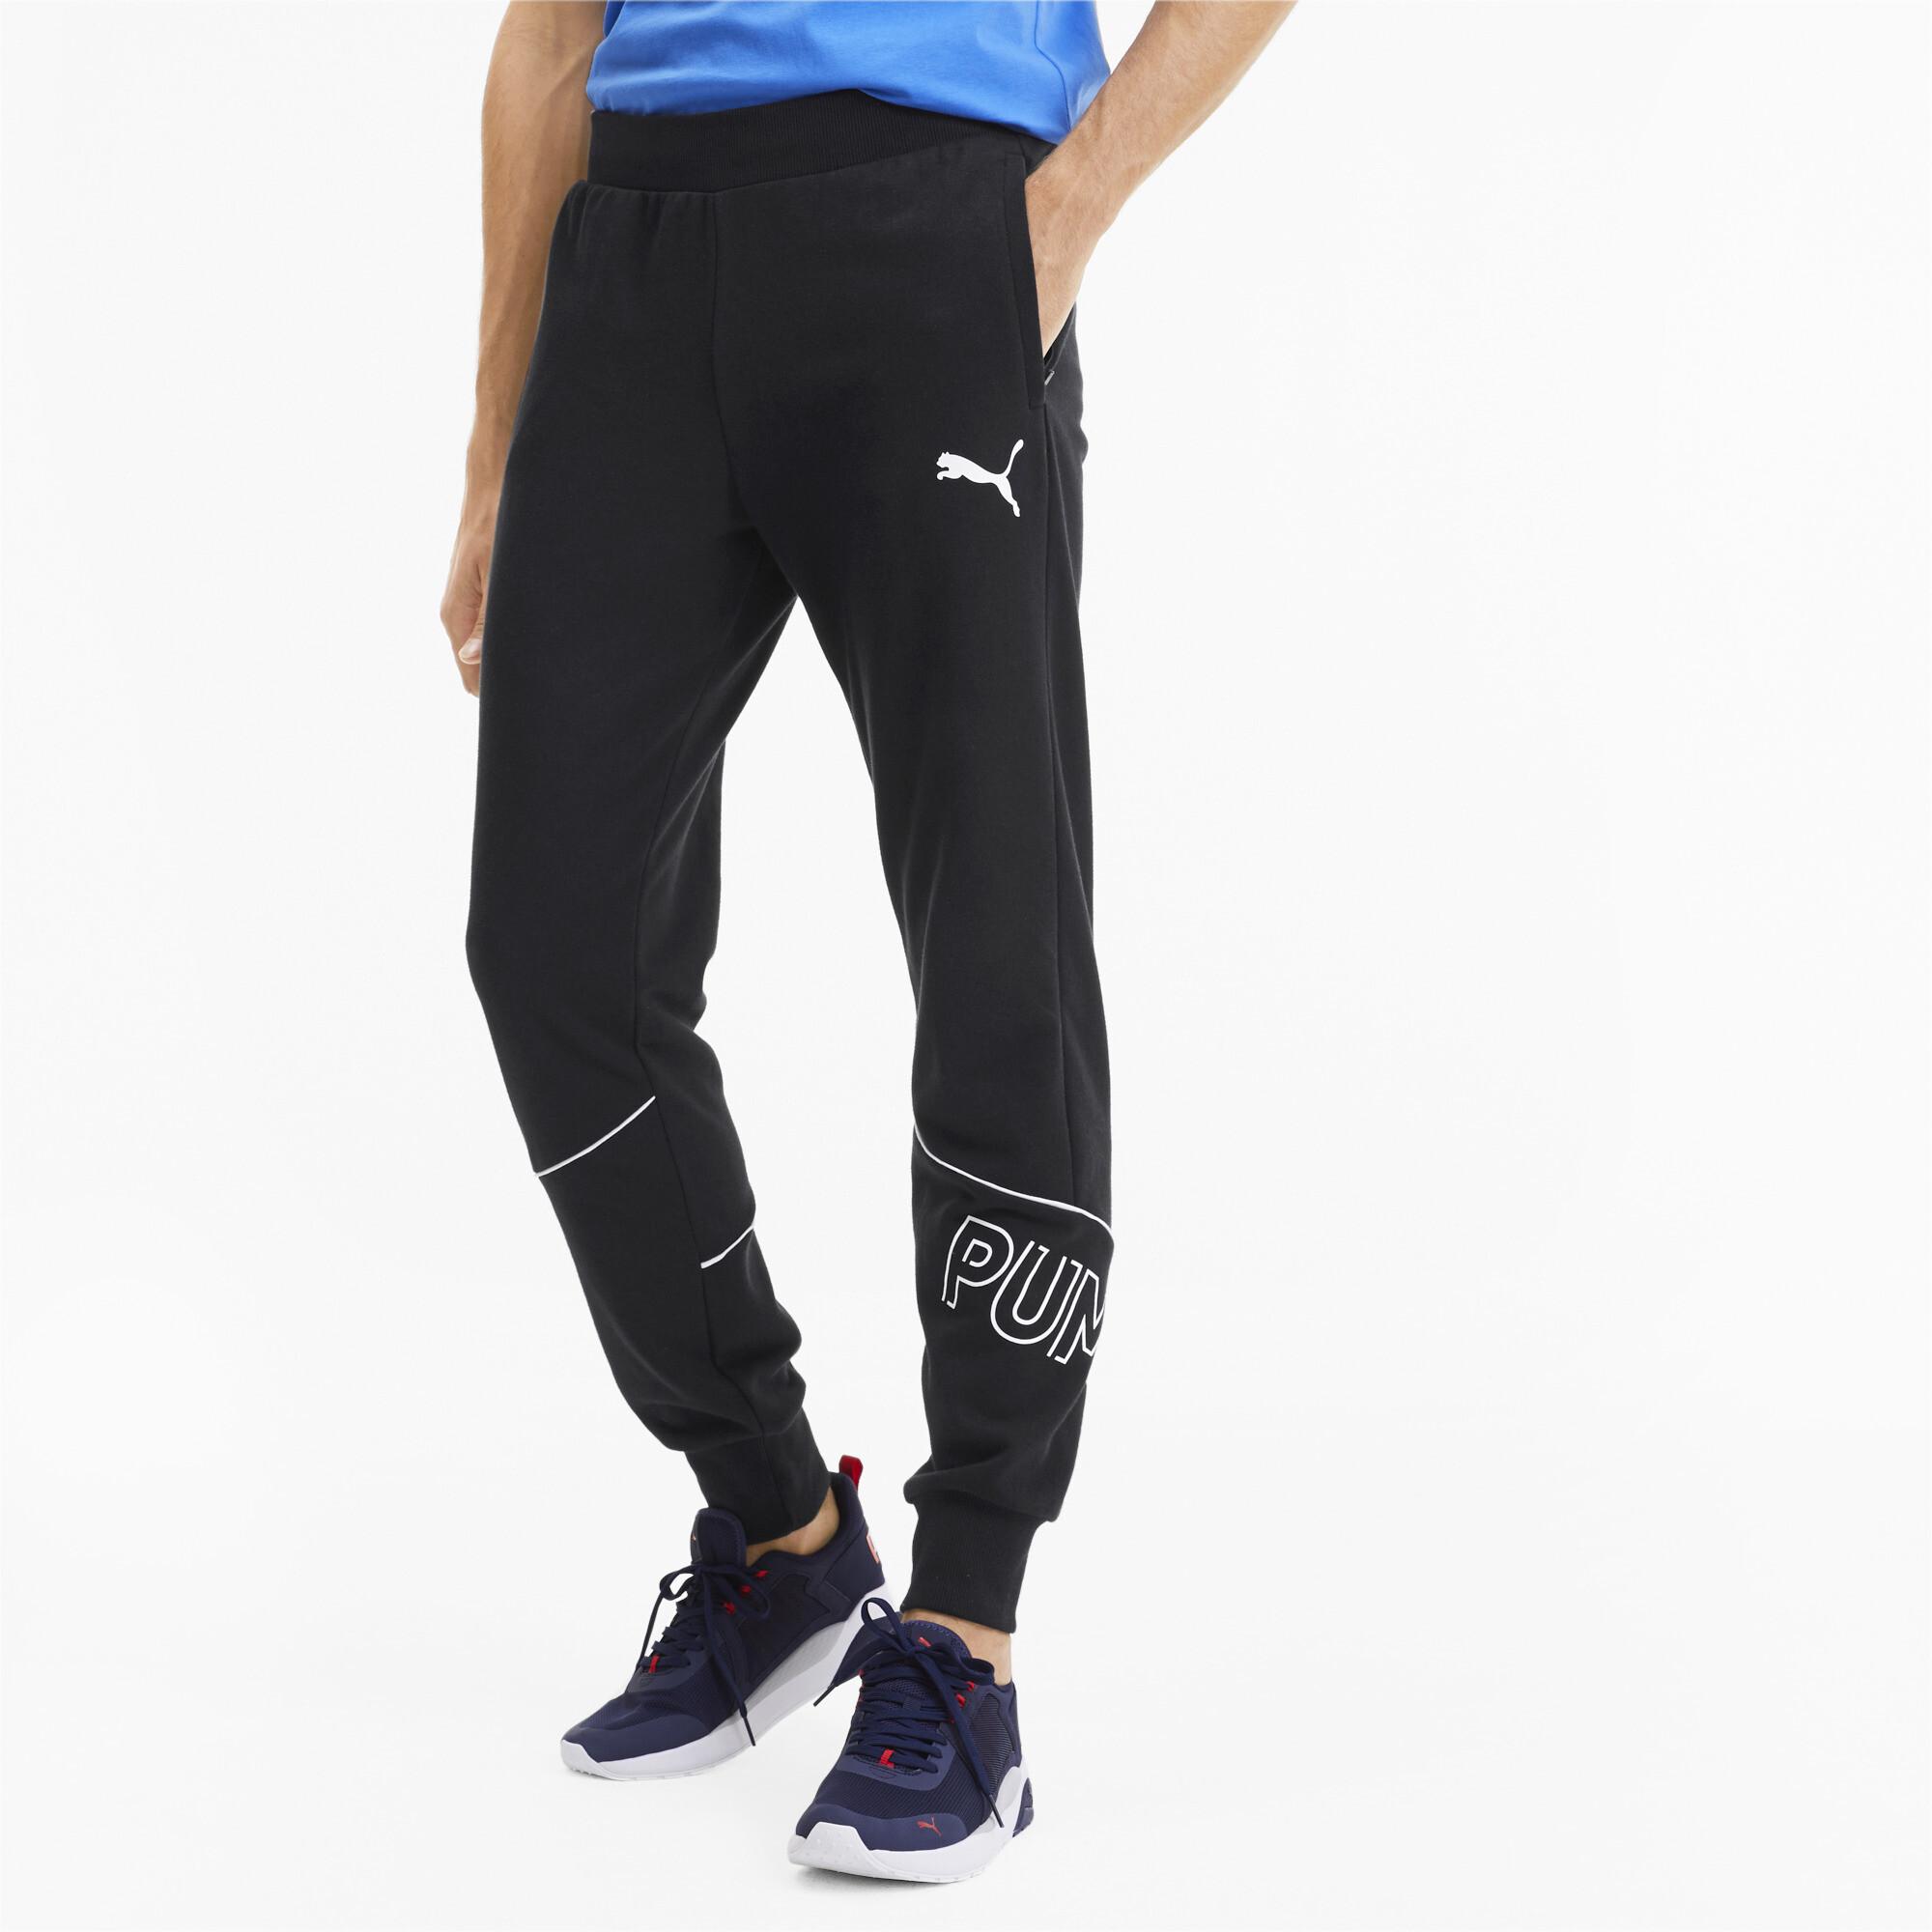 PUMA-Men-039-s-Modern-Sports-Sweatpants thumbnail 9